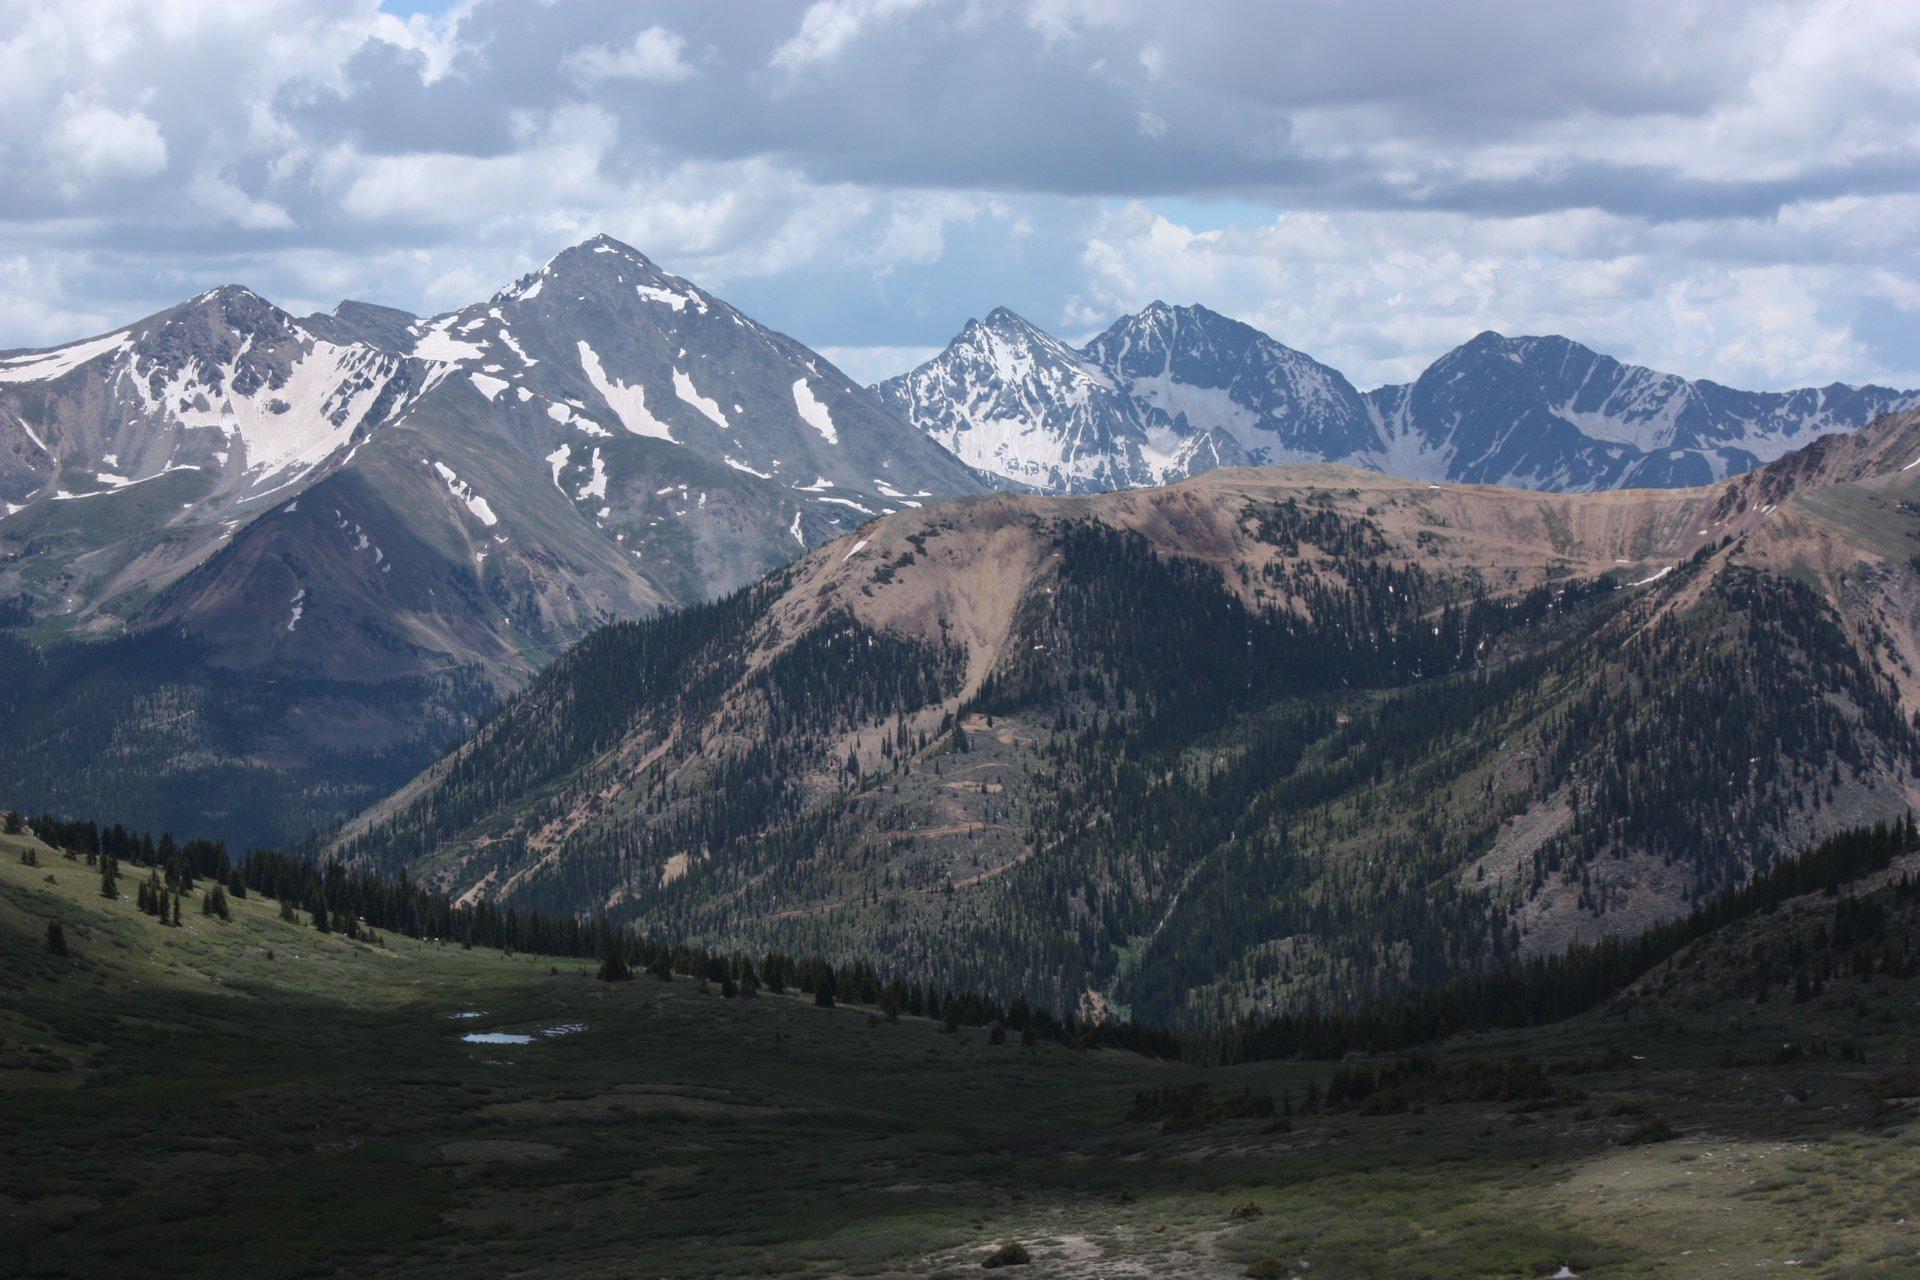 Best time for La Plata Peak in Colorado 2020